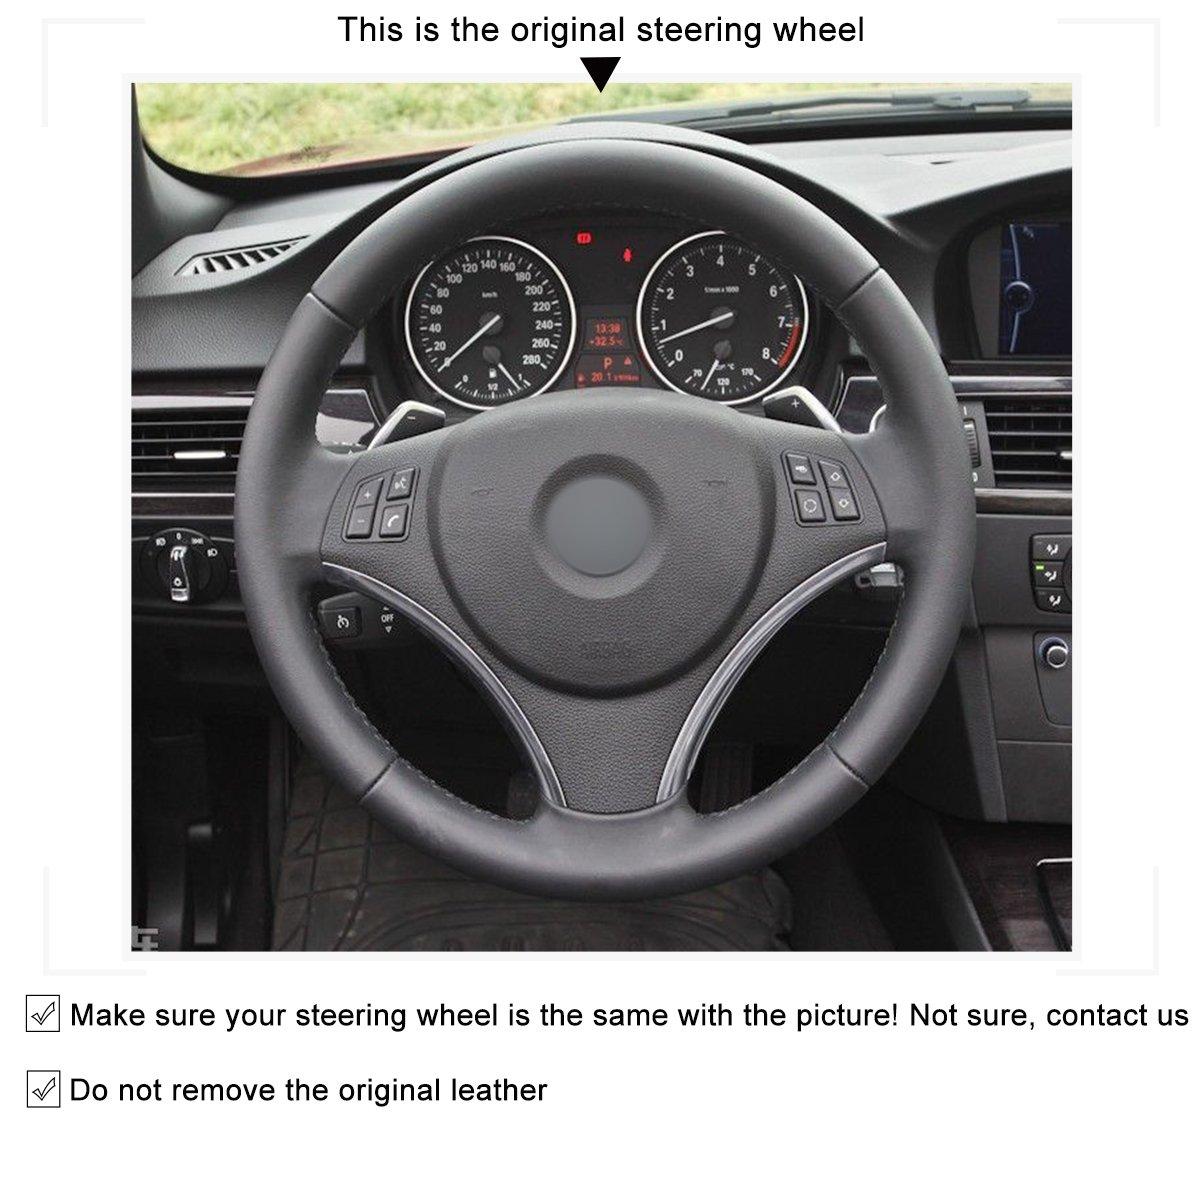 MEWANT Customized Hand-Stitched DIY Black Genuine Leather Car Steering Wheel Covers for BMW E90 325i 330i 335i E87 120i 130i 120d